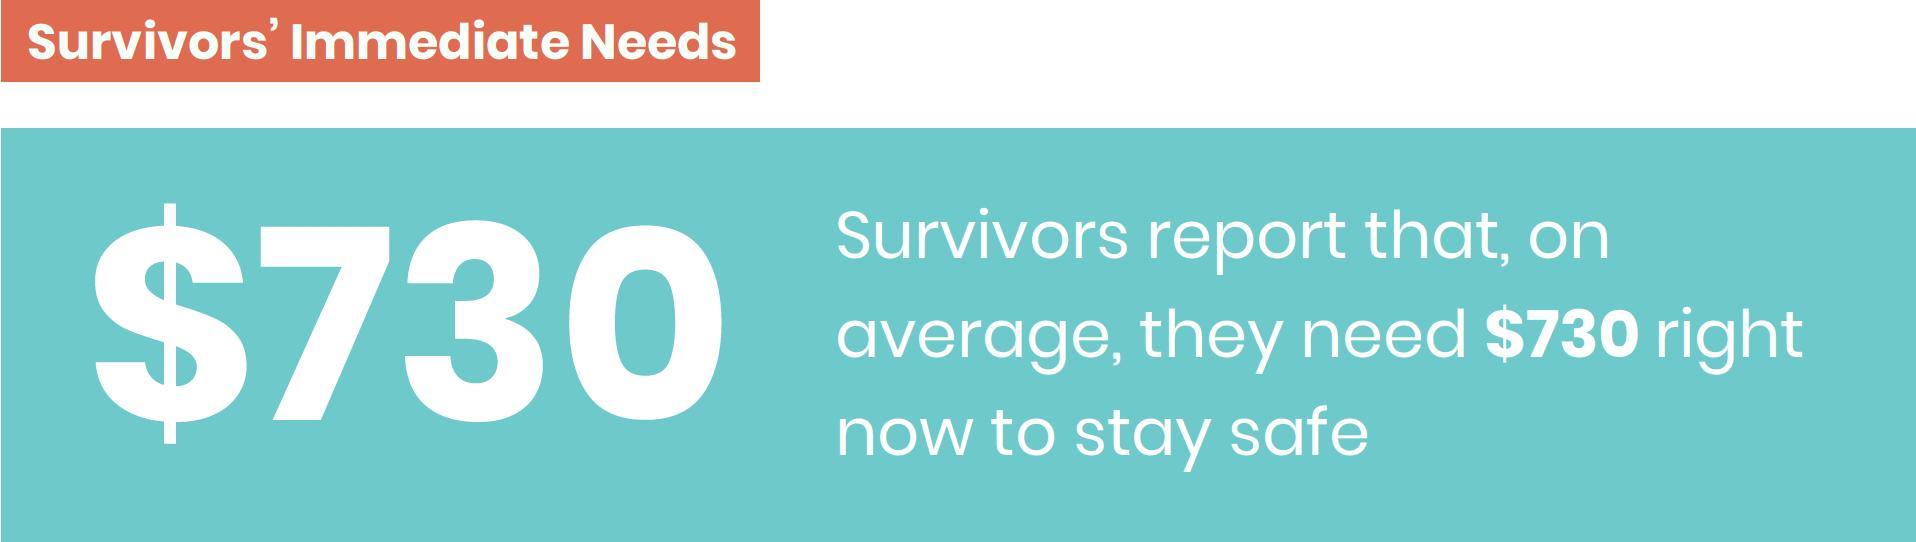 Survivors' Immediate Needs $730